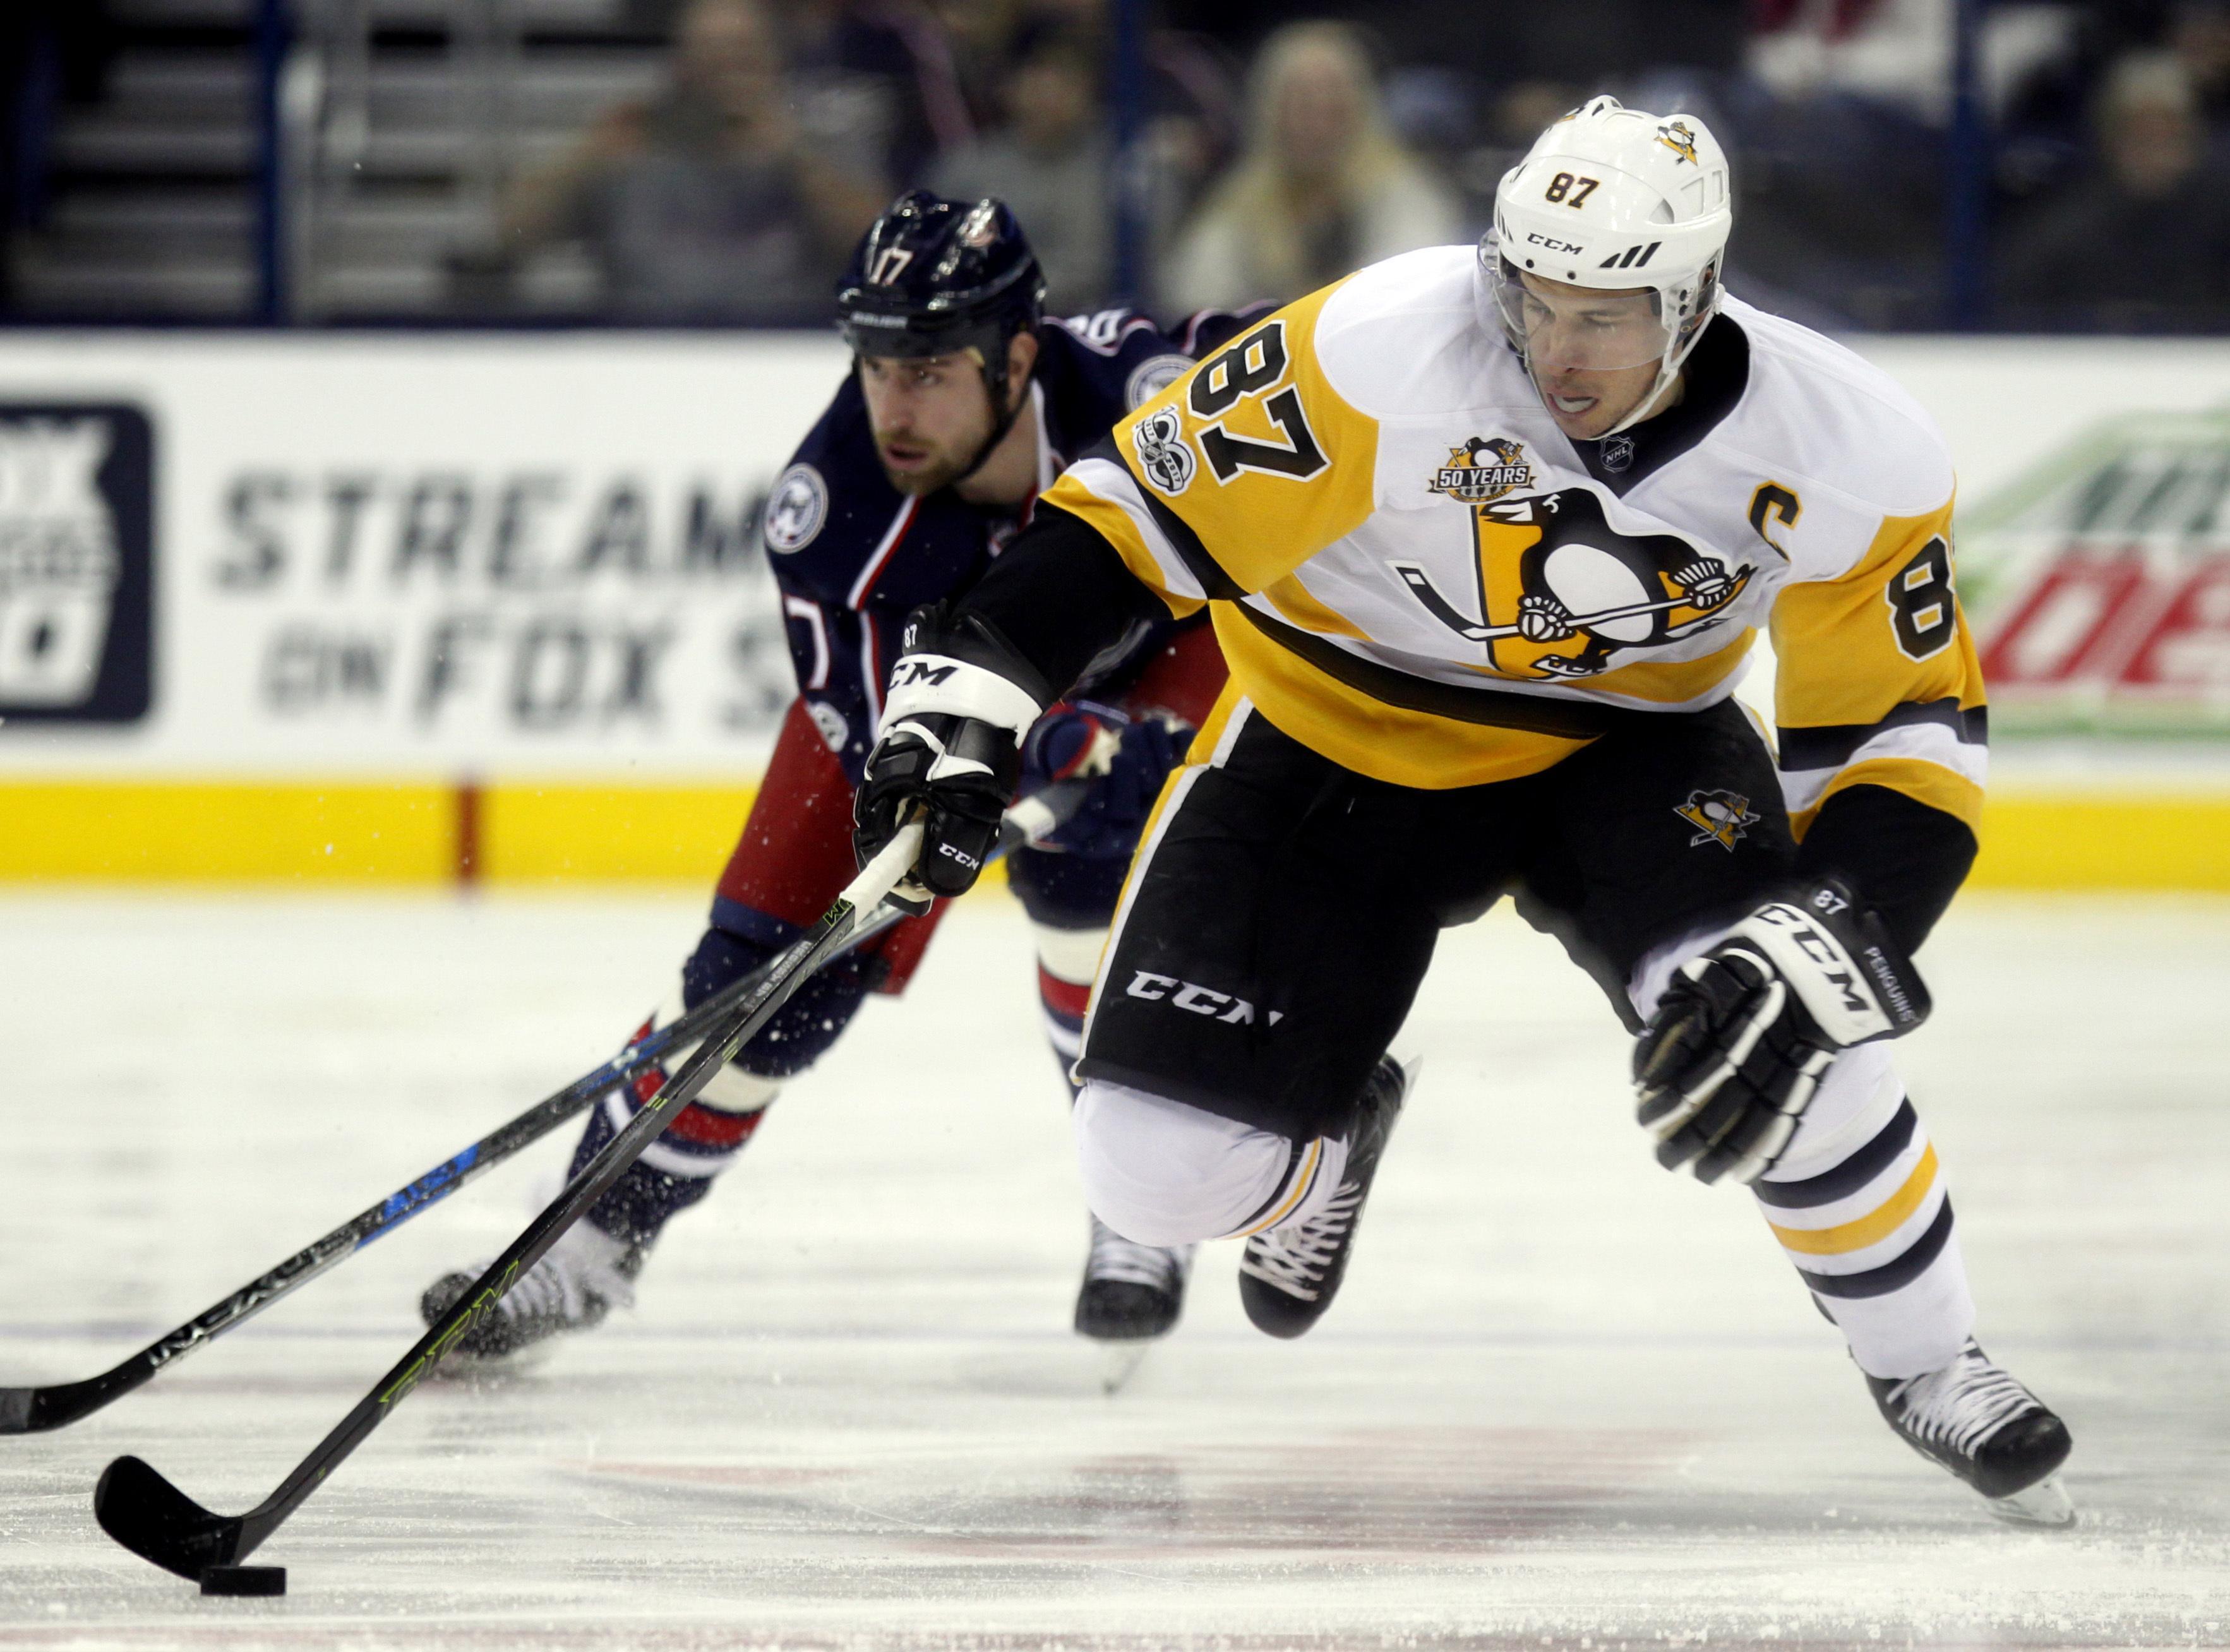 Penguins_blue_jackets_hockey_89852